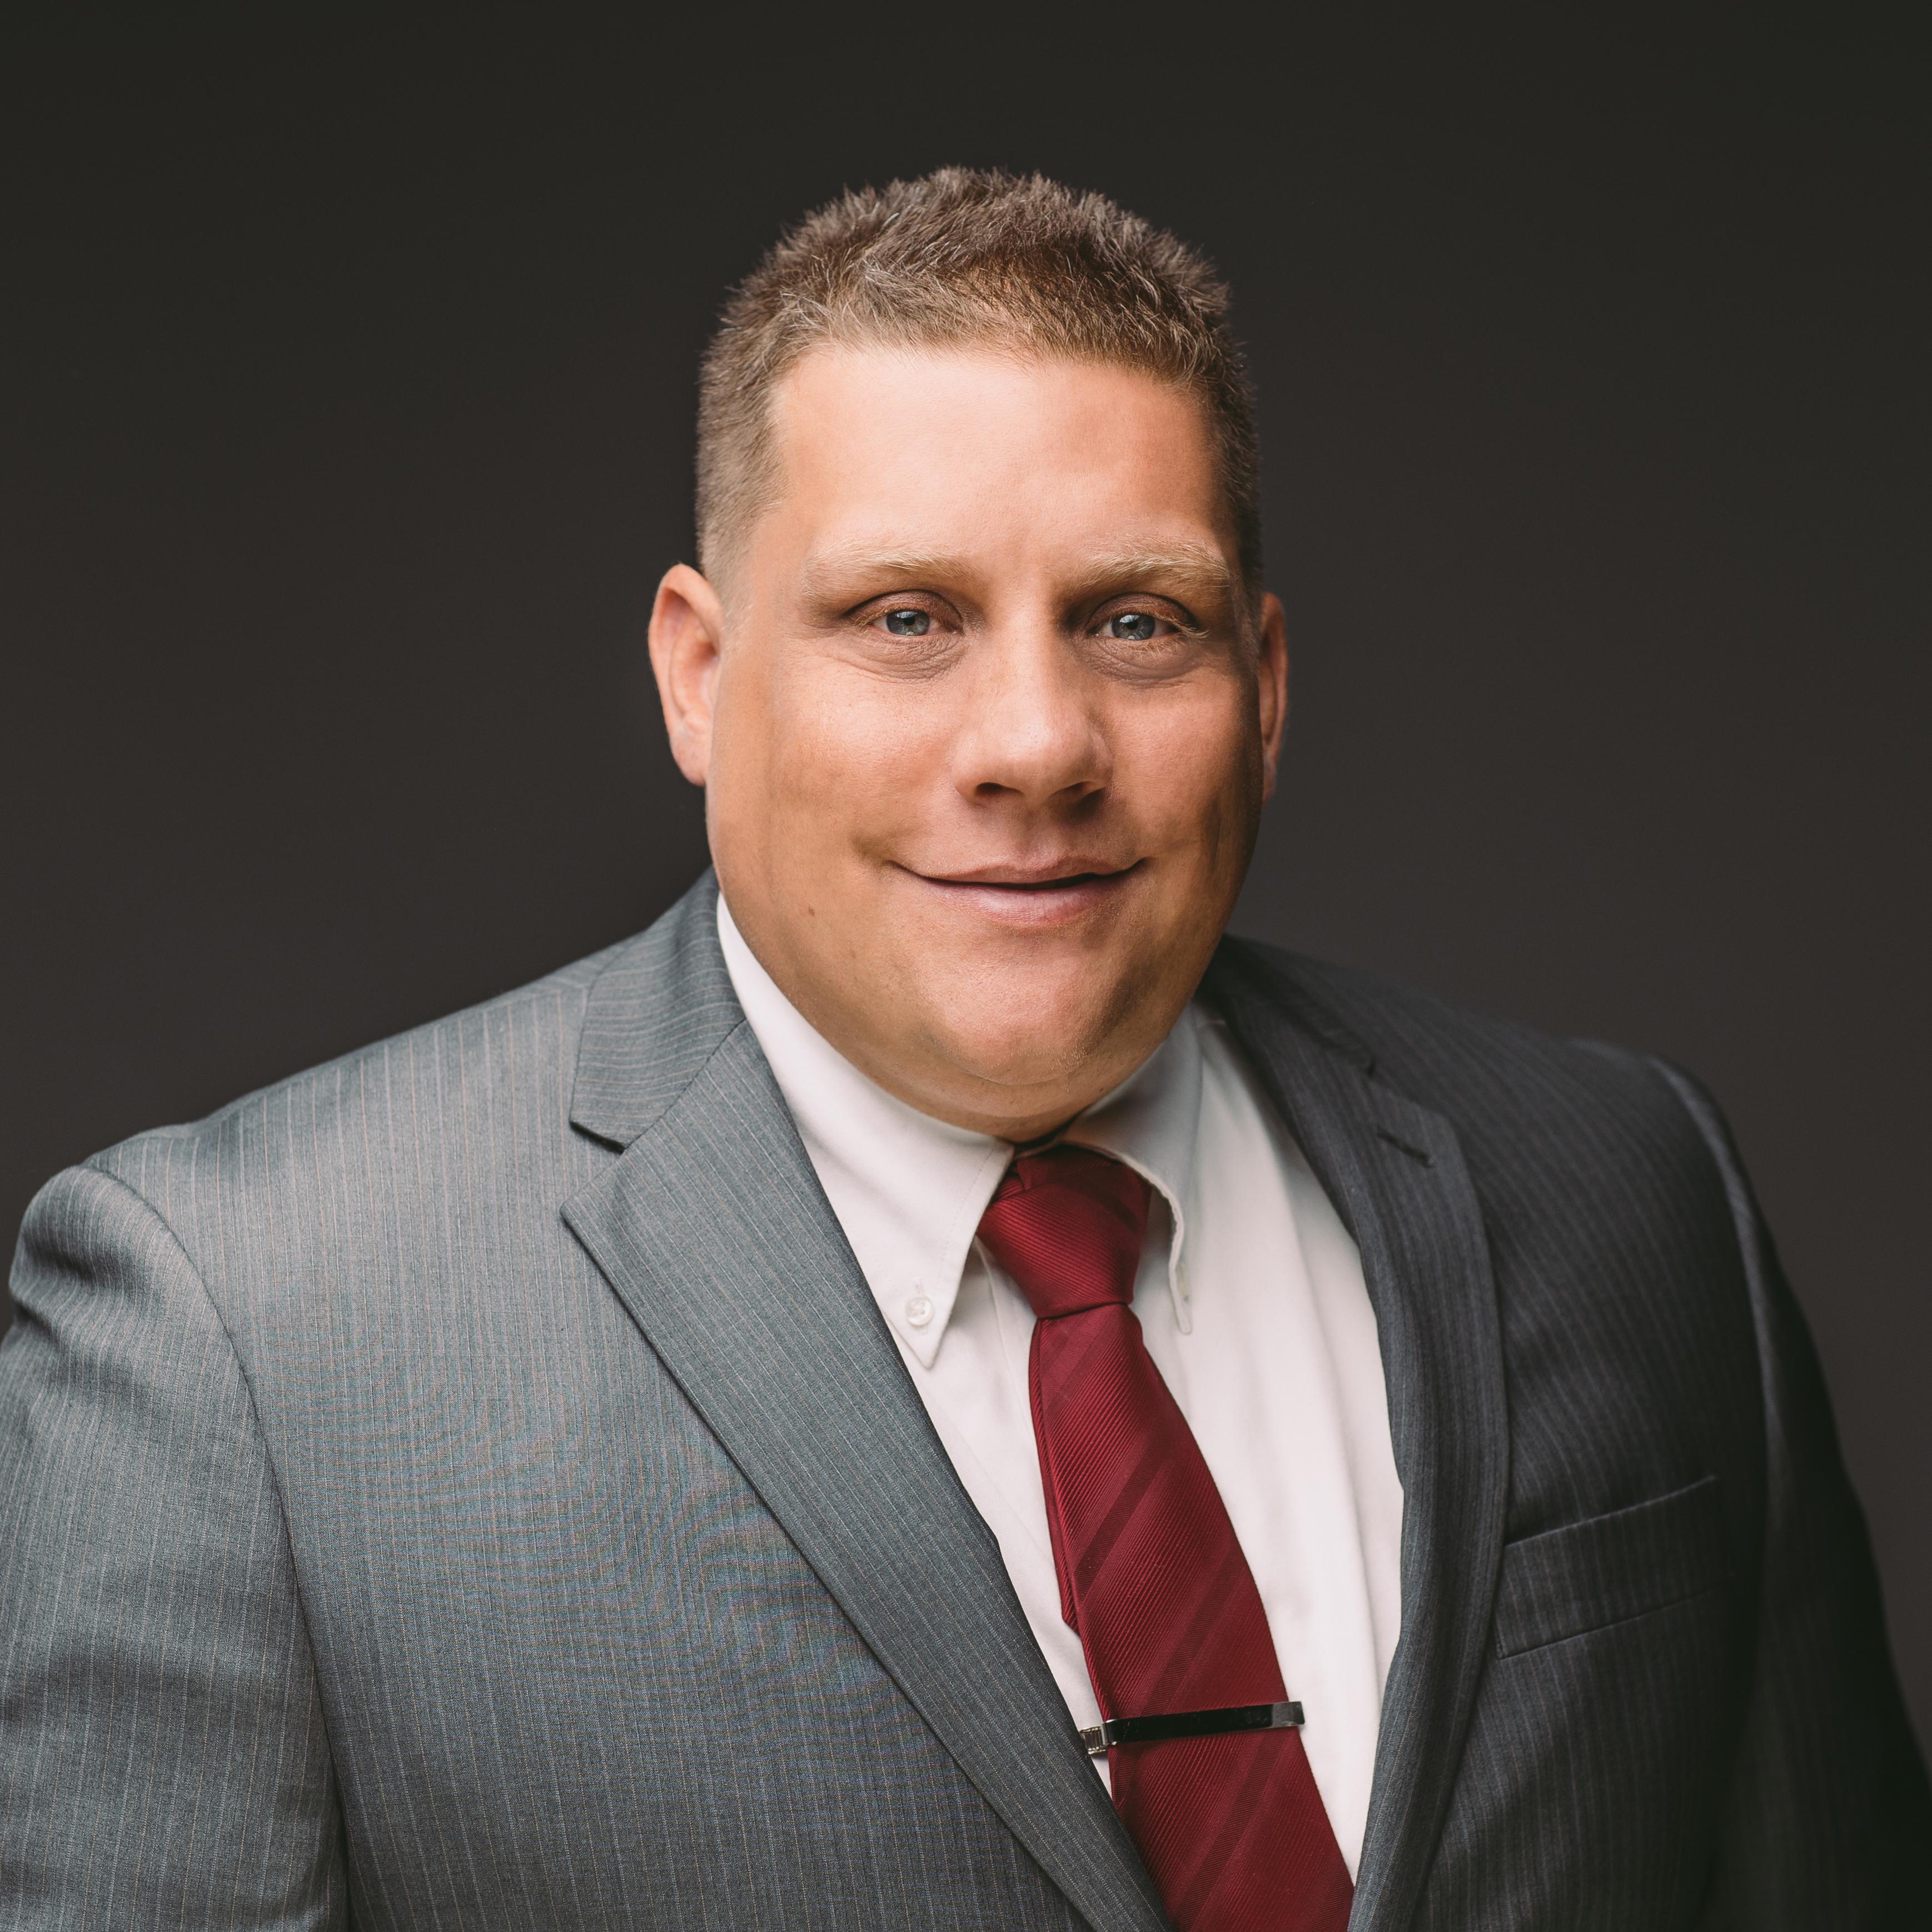 Kevin M. Guthard